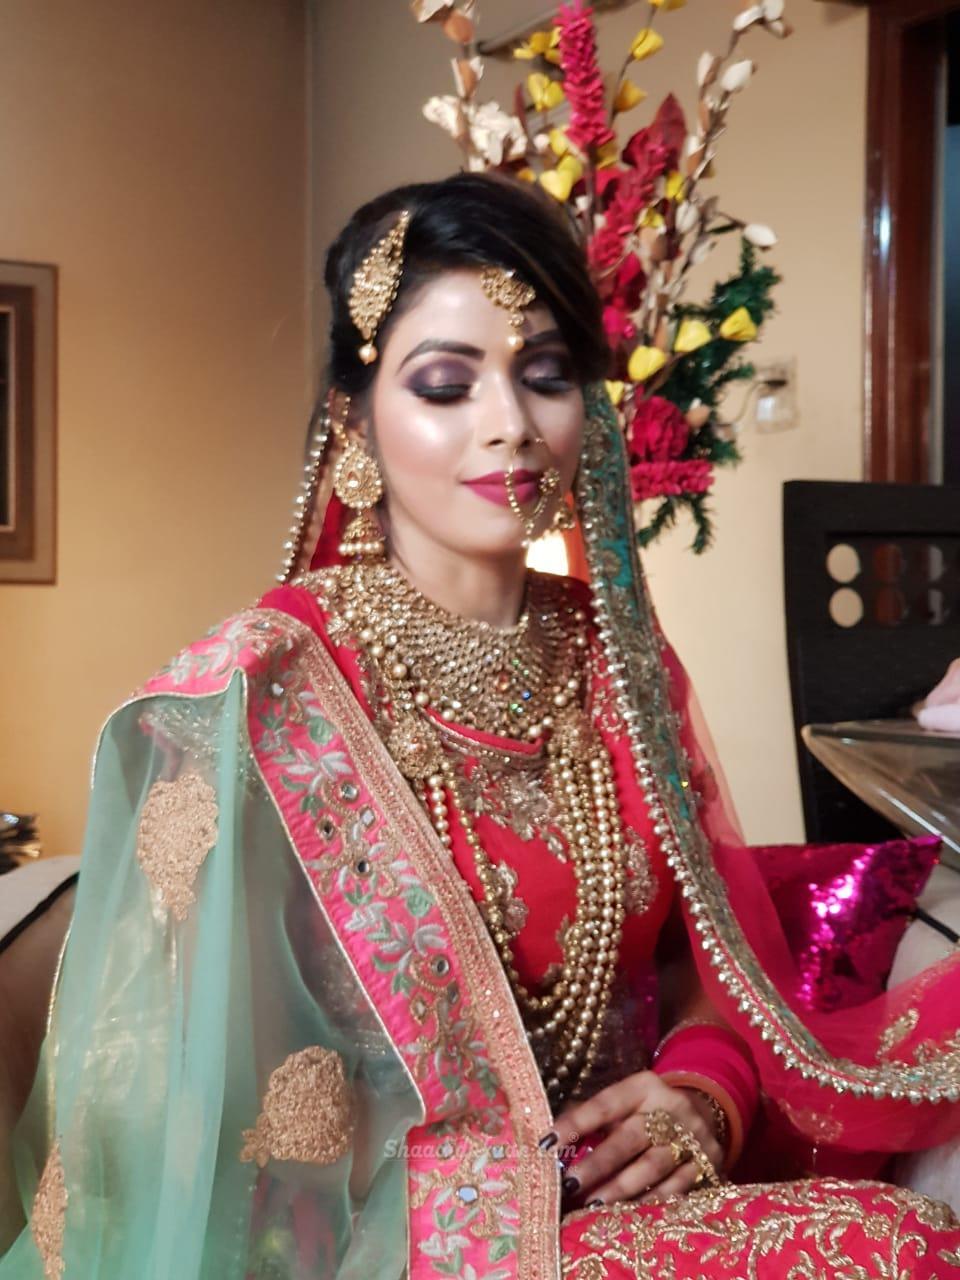 Garima Baranwal Professional Makeup Artist